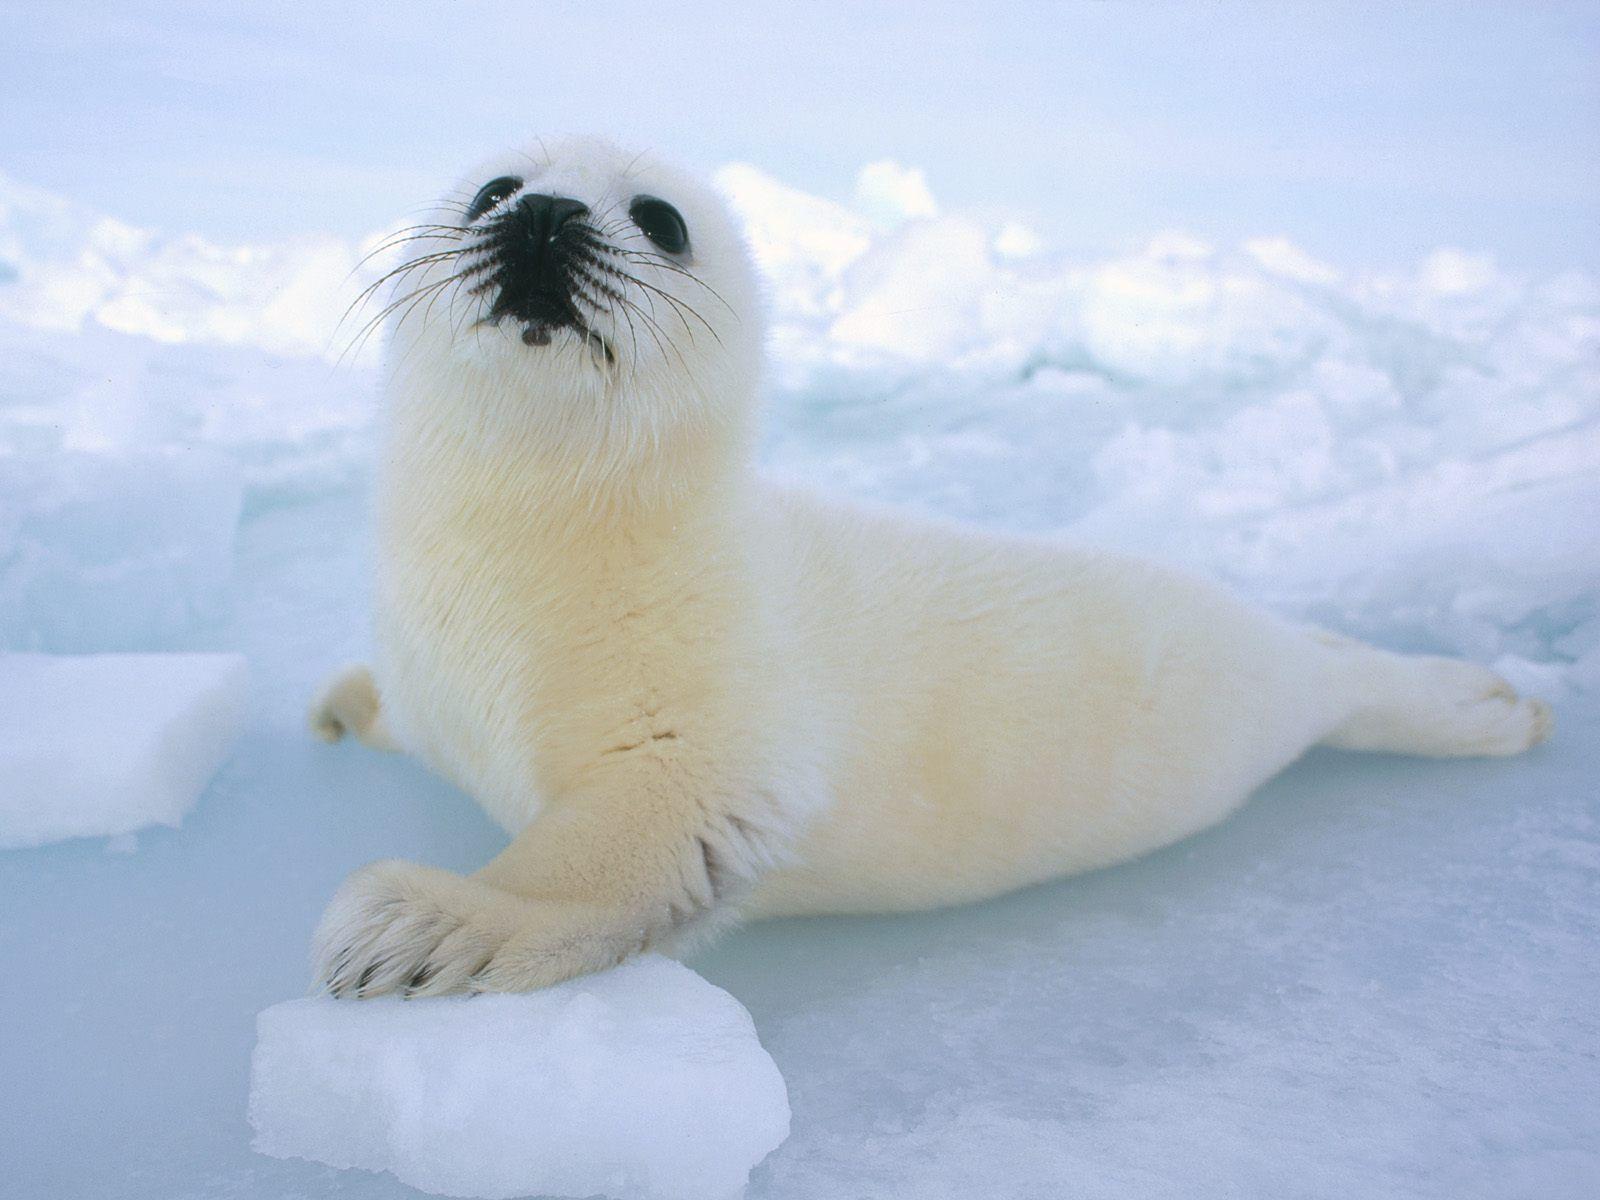 White Baby Harp Seal